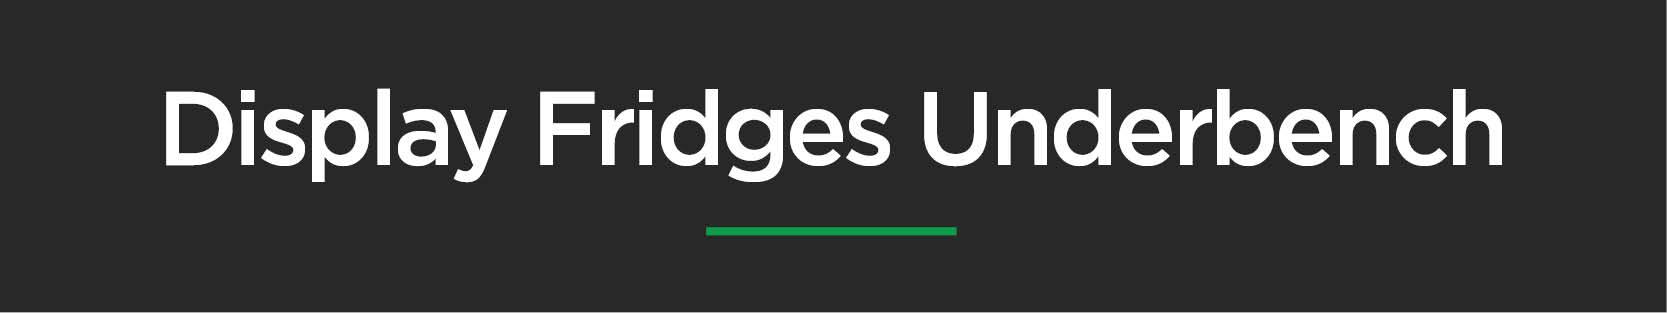 Display Fridges - Underbench